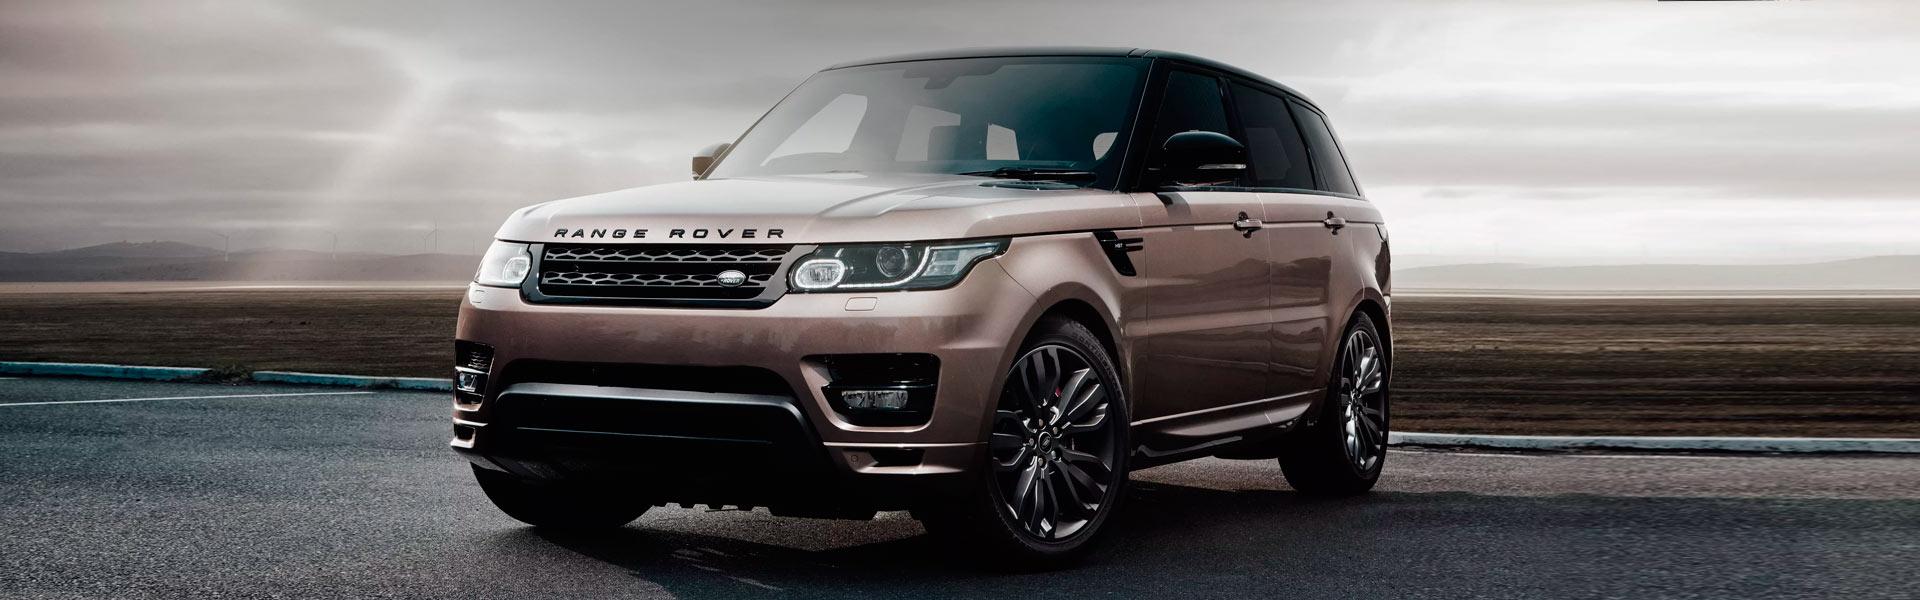 Ремонт турбины Land Rover Range Rover